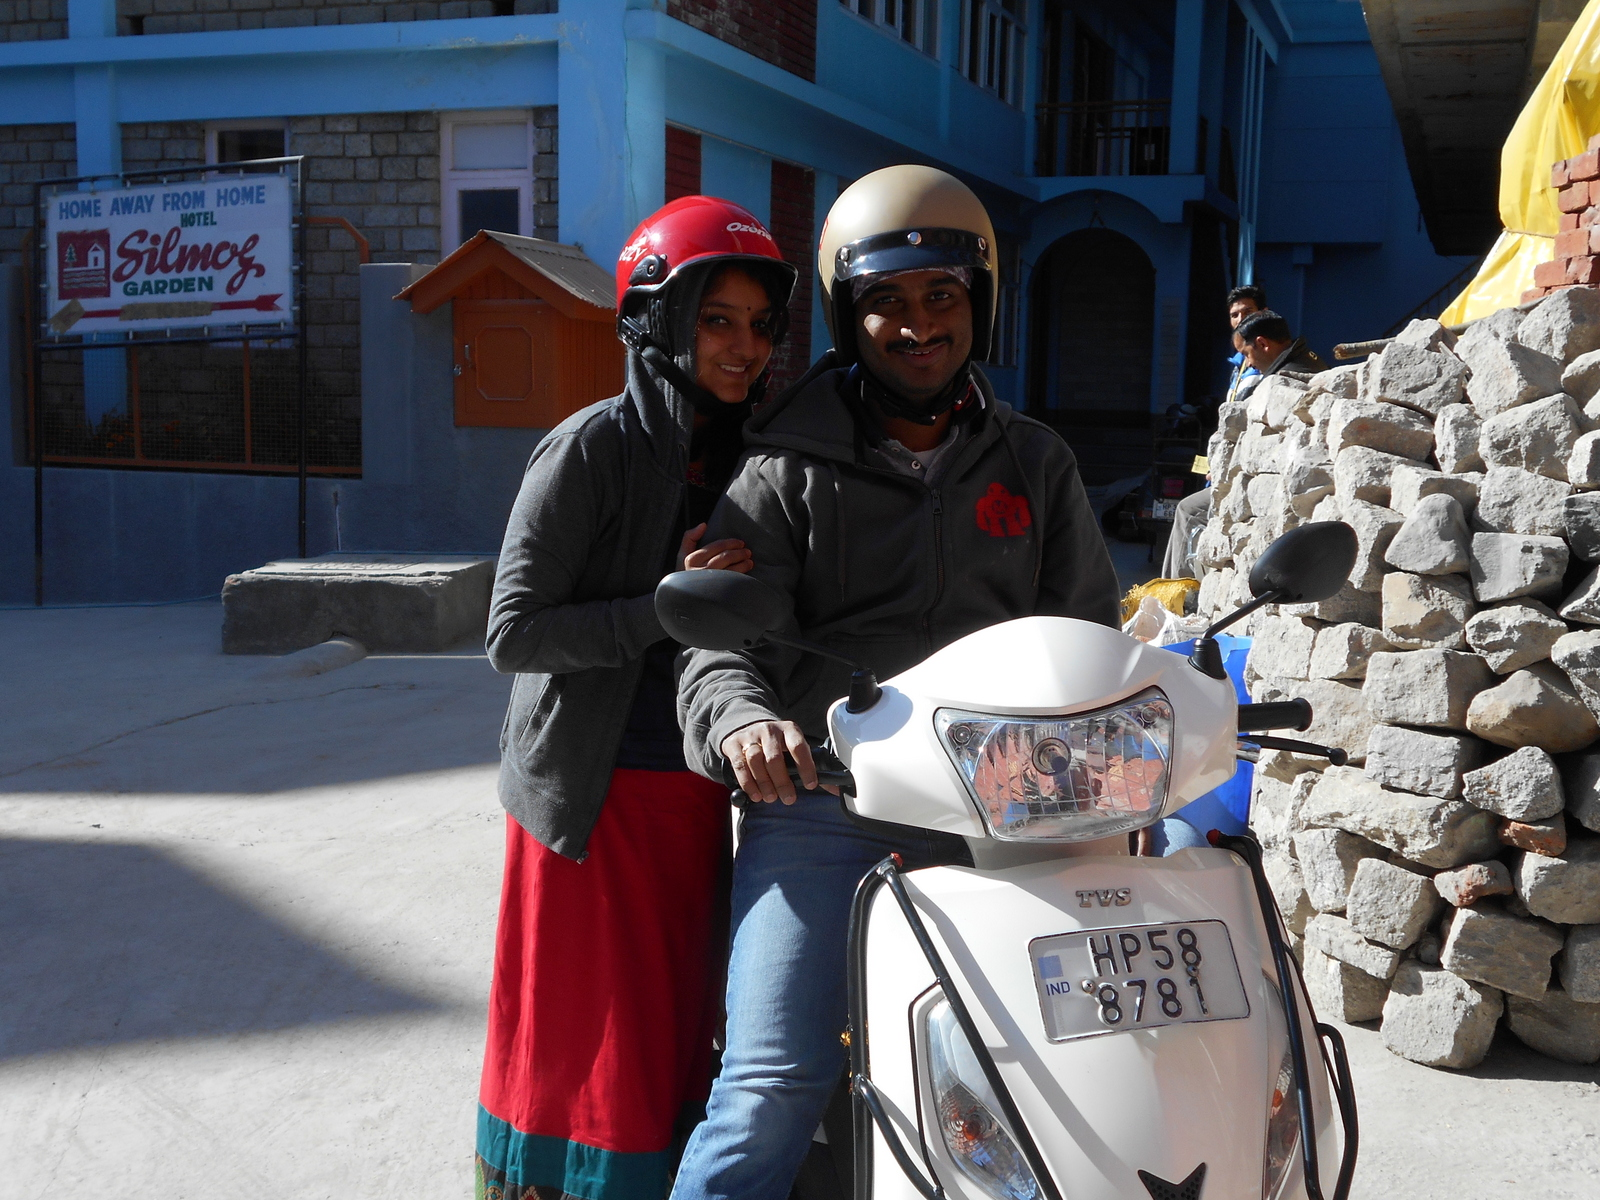 manali-bike-scooter-rentals-1